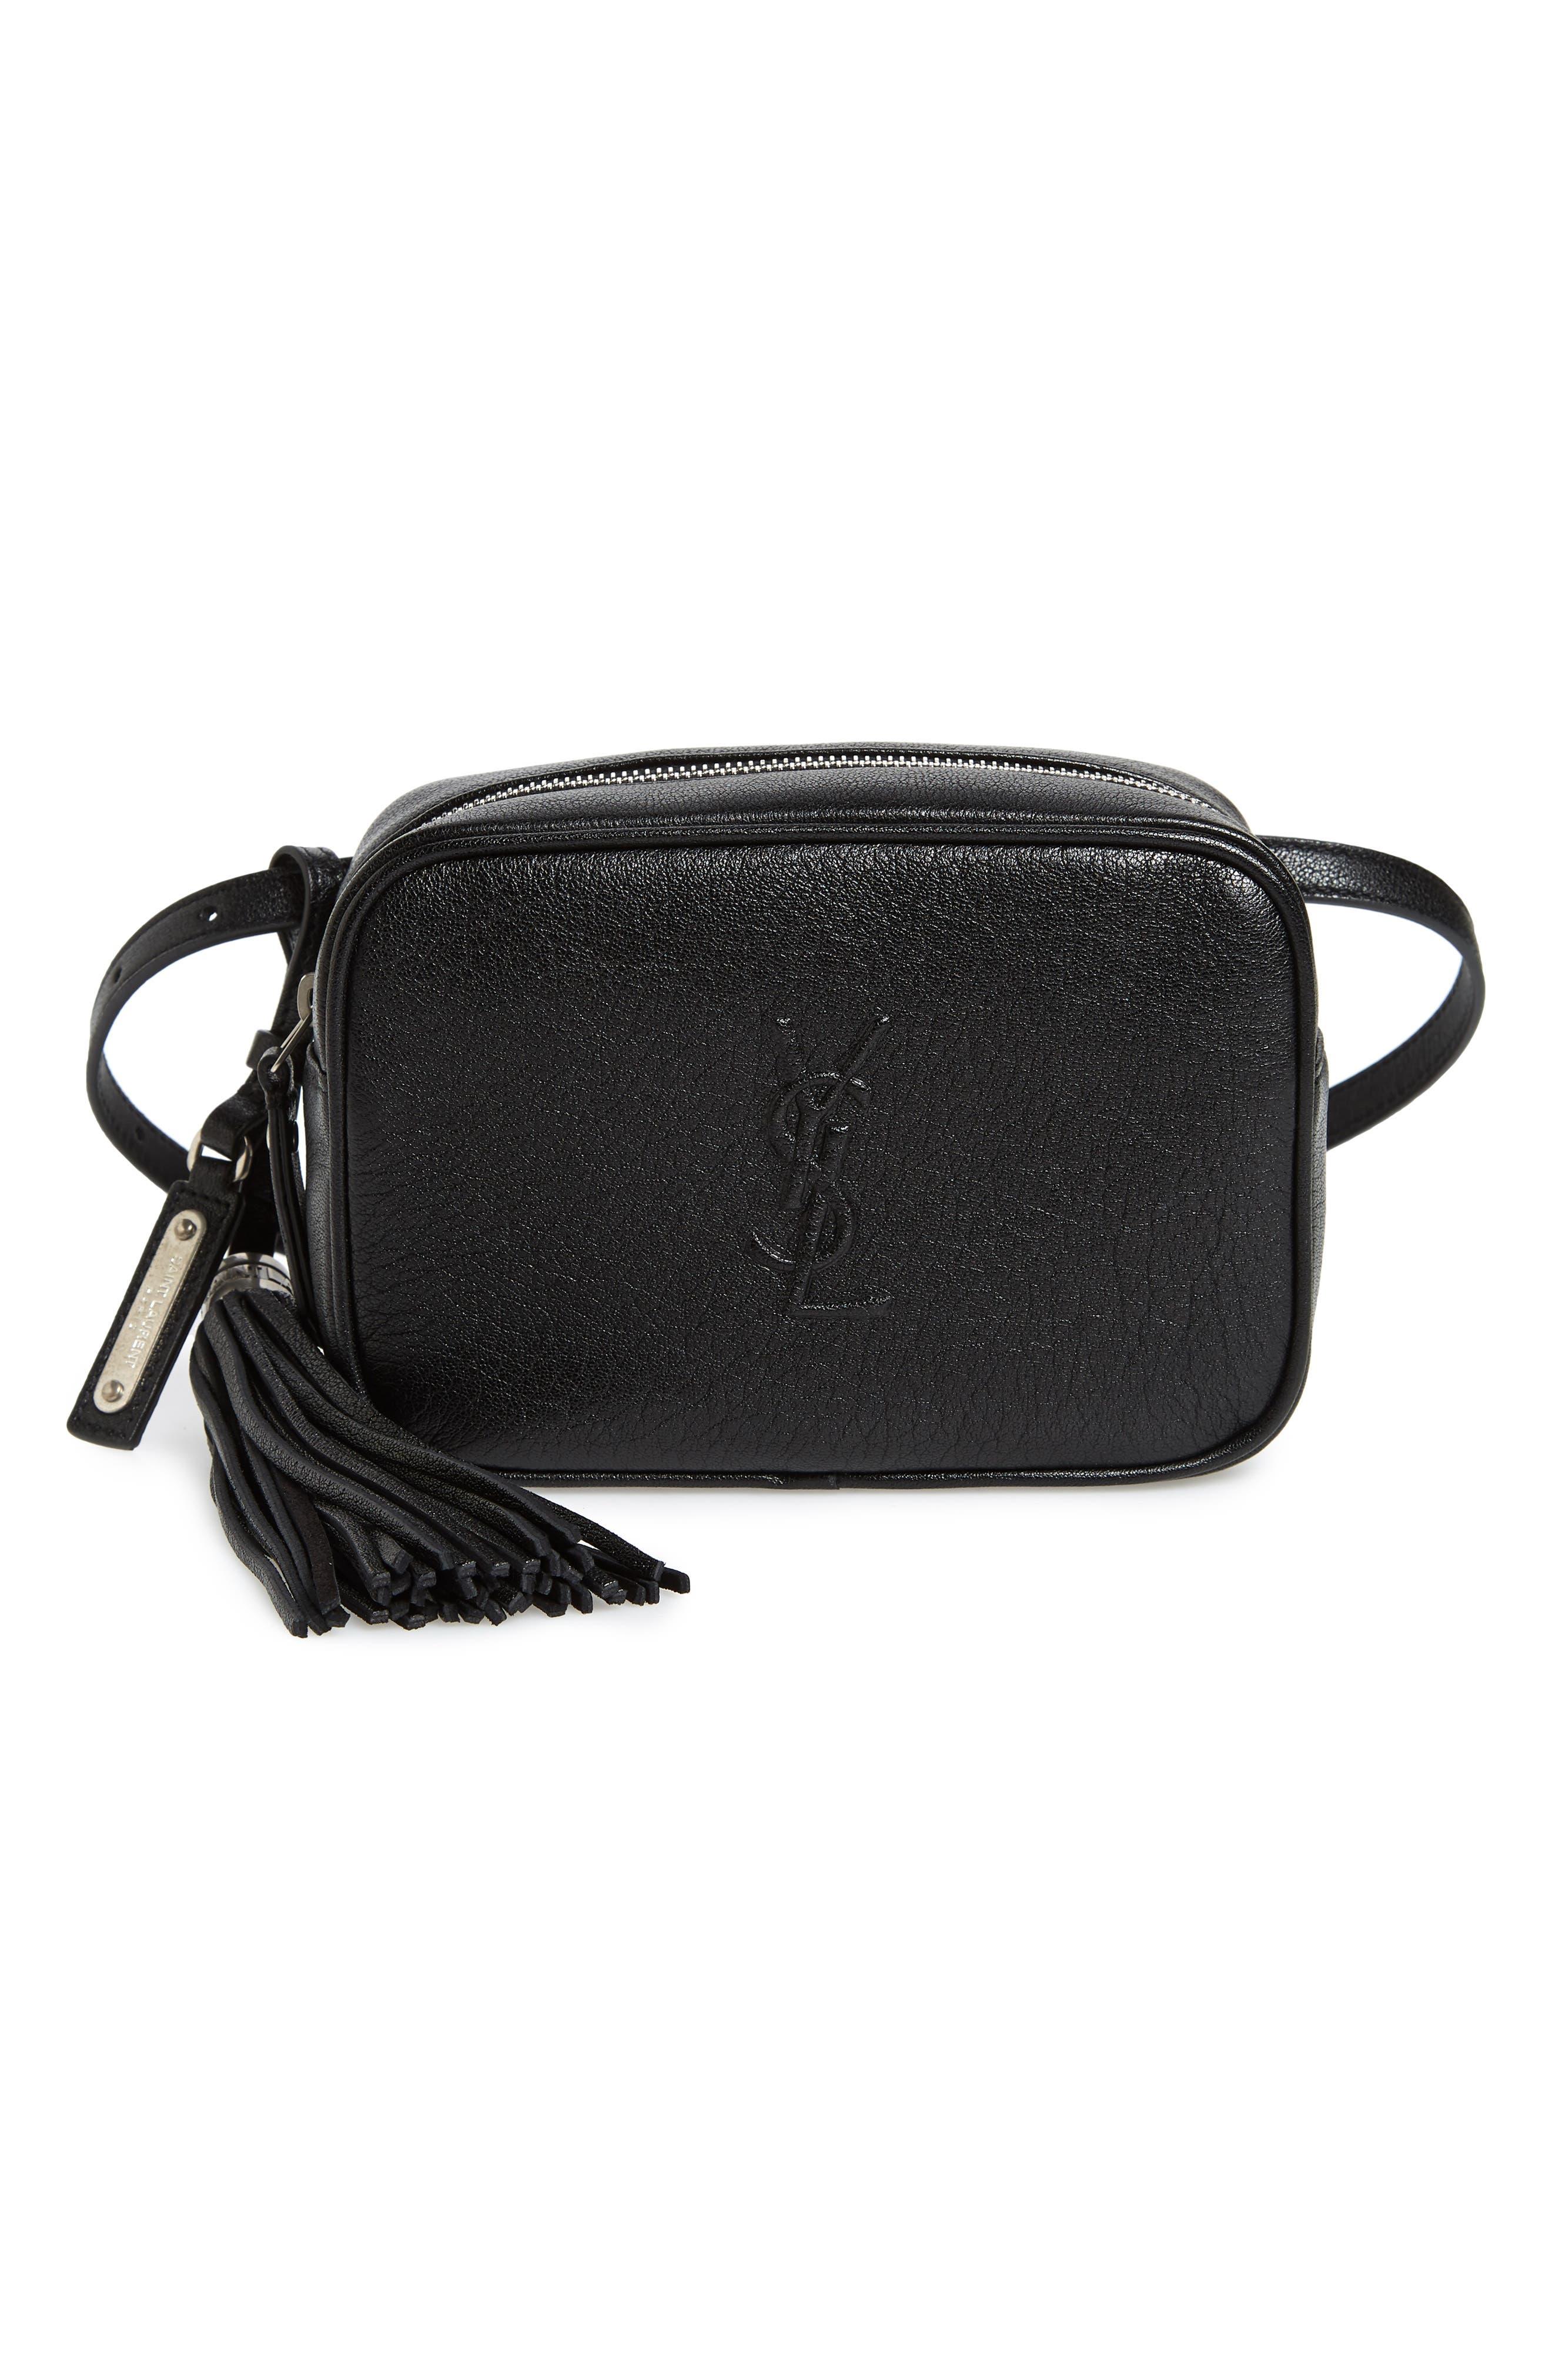 Loulou Tassel Leather Belt Bag,                             Main thumbnail 1, color,                             001